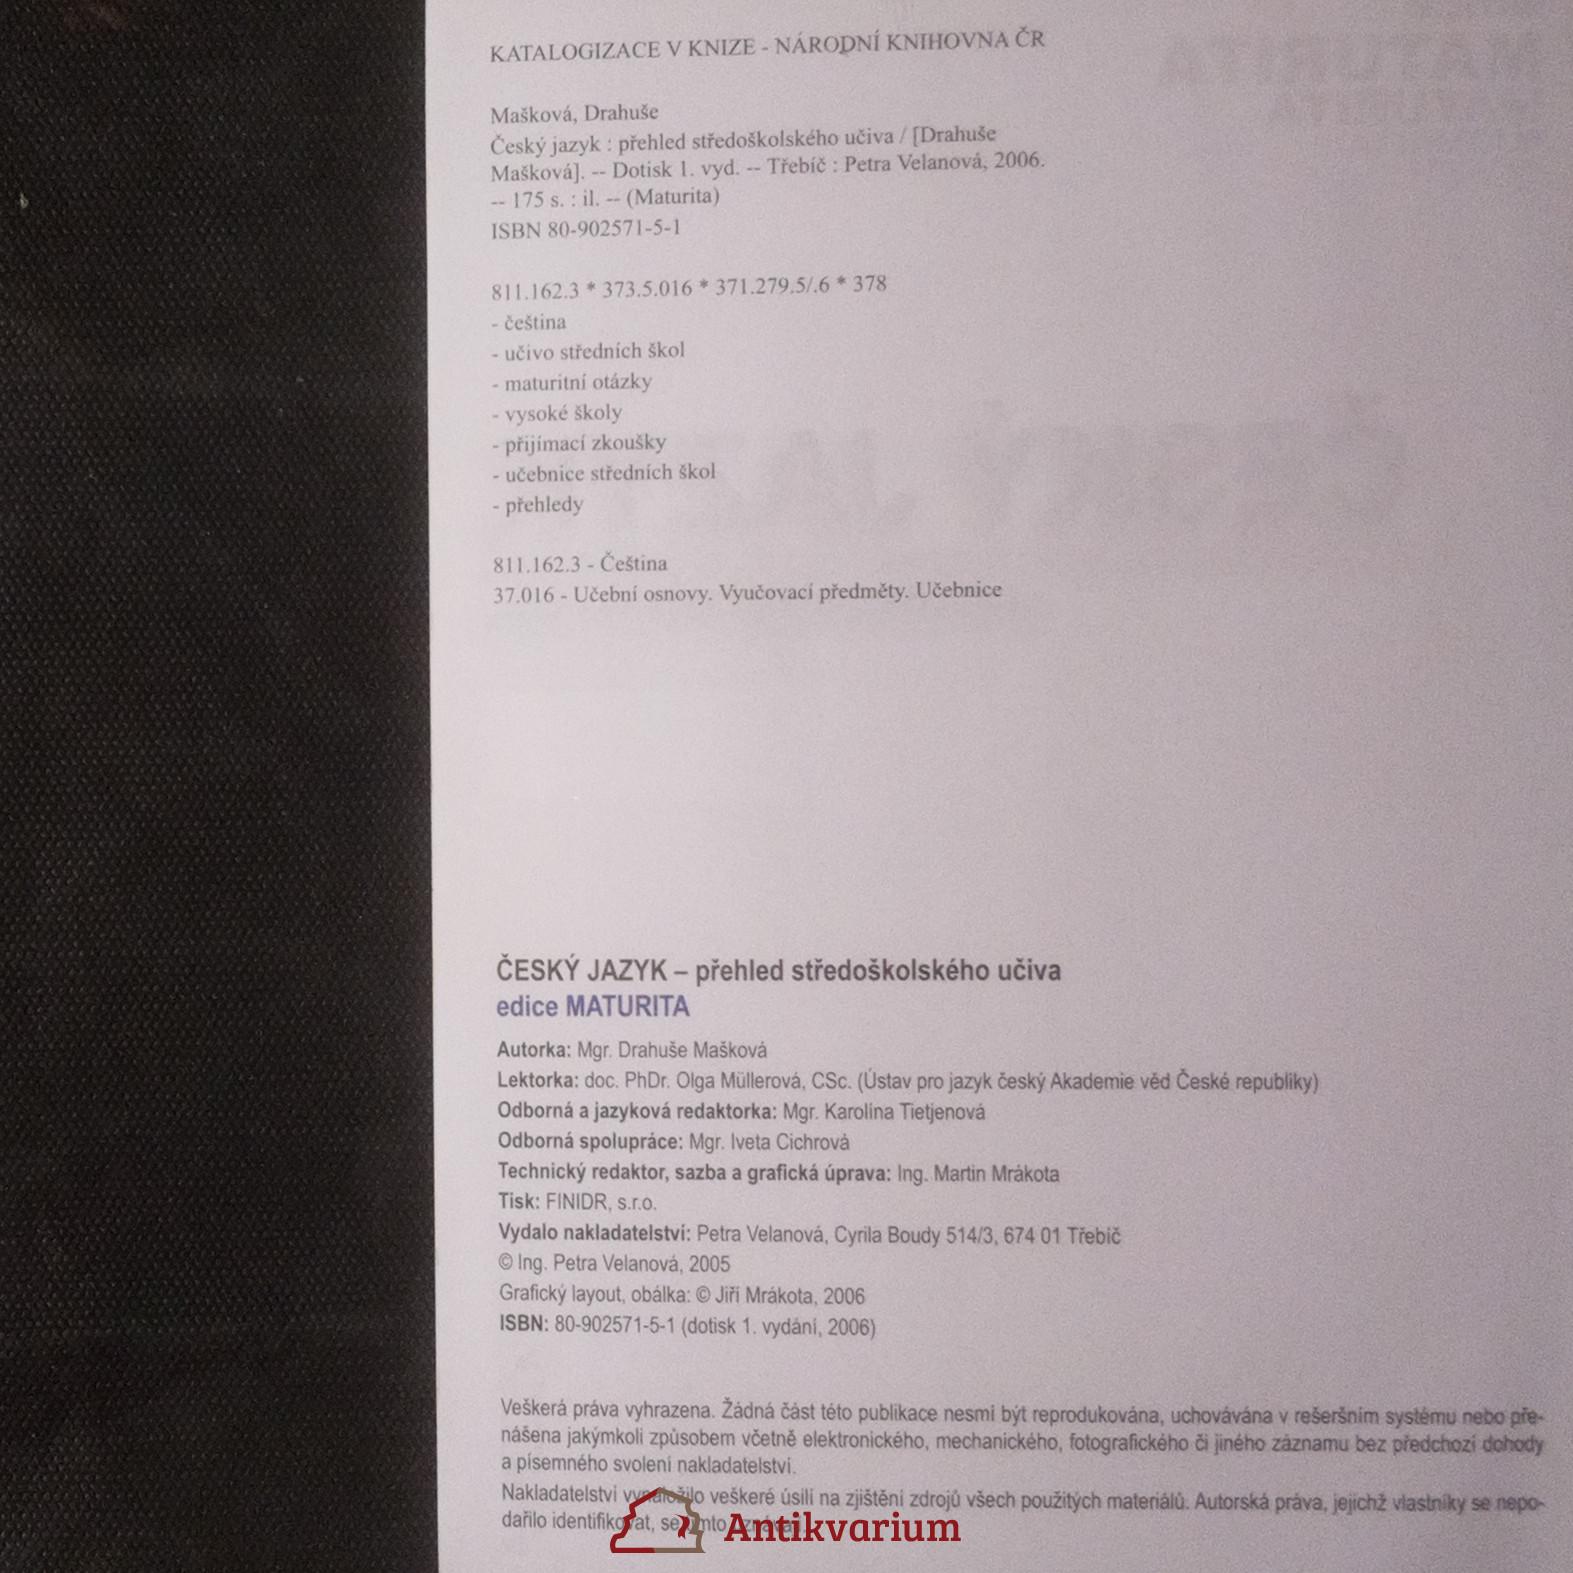 Cesky Jazyk Prehled Stredoskolskeho Uciva Antikvariat Praha